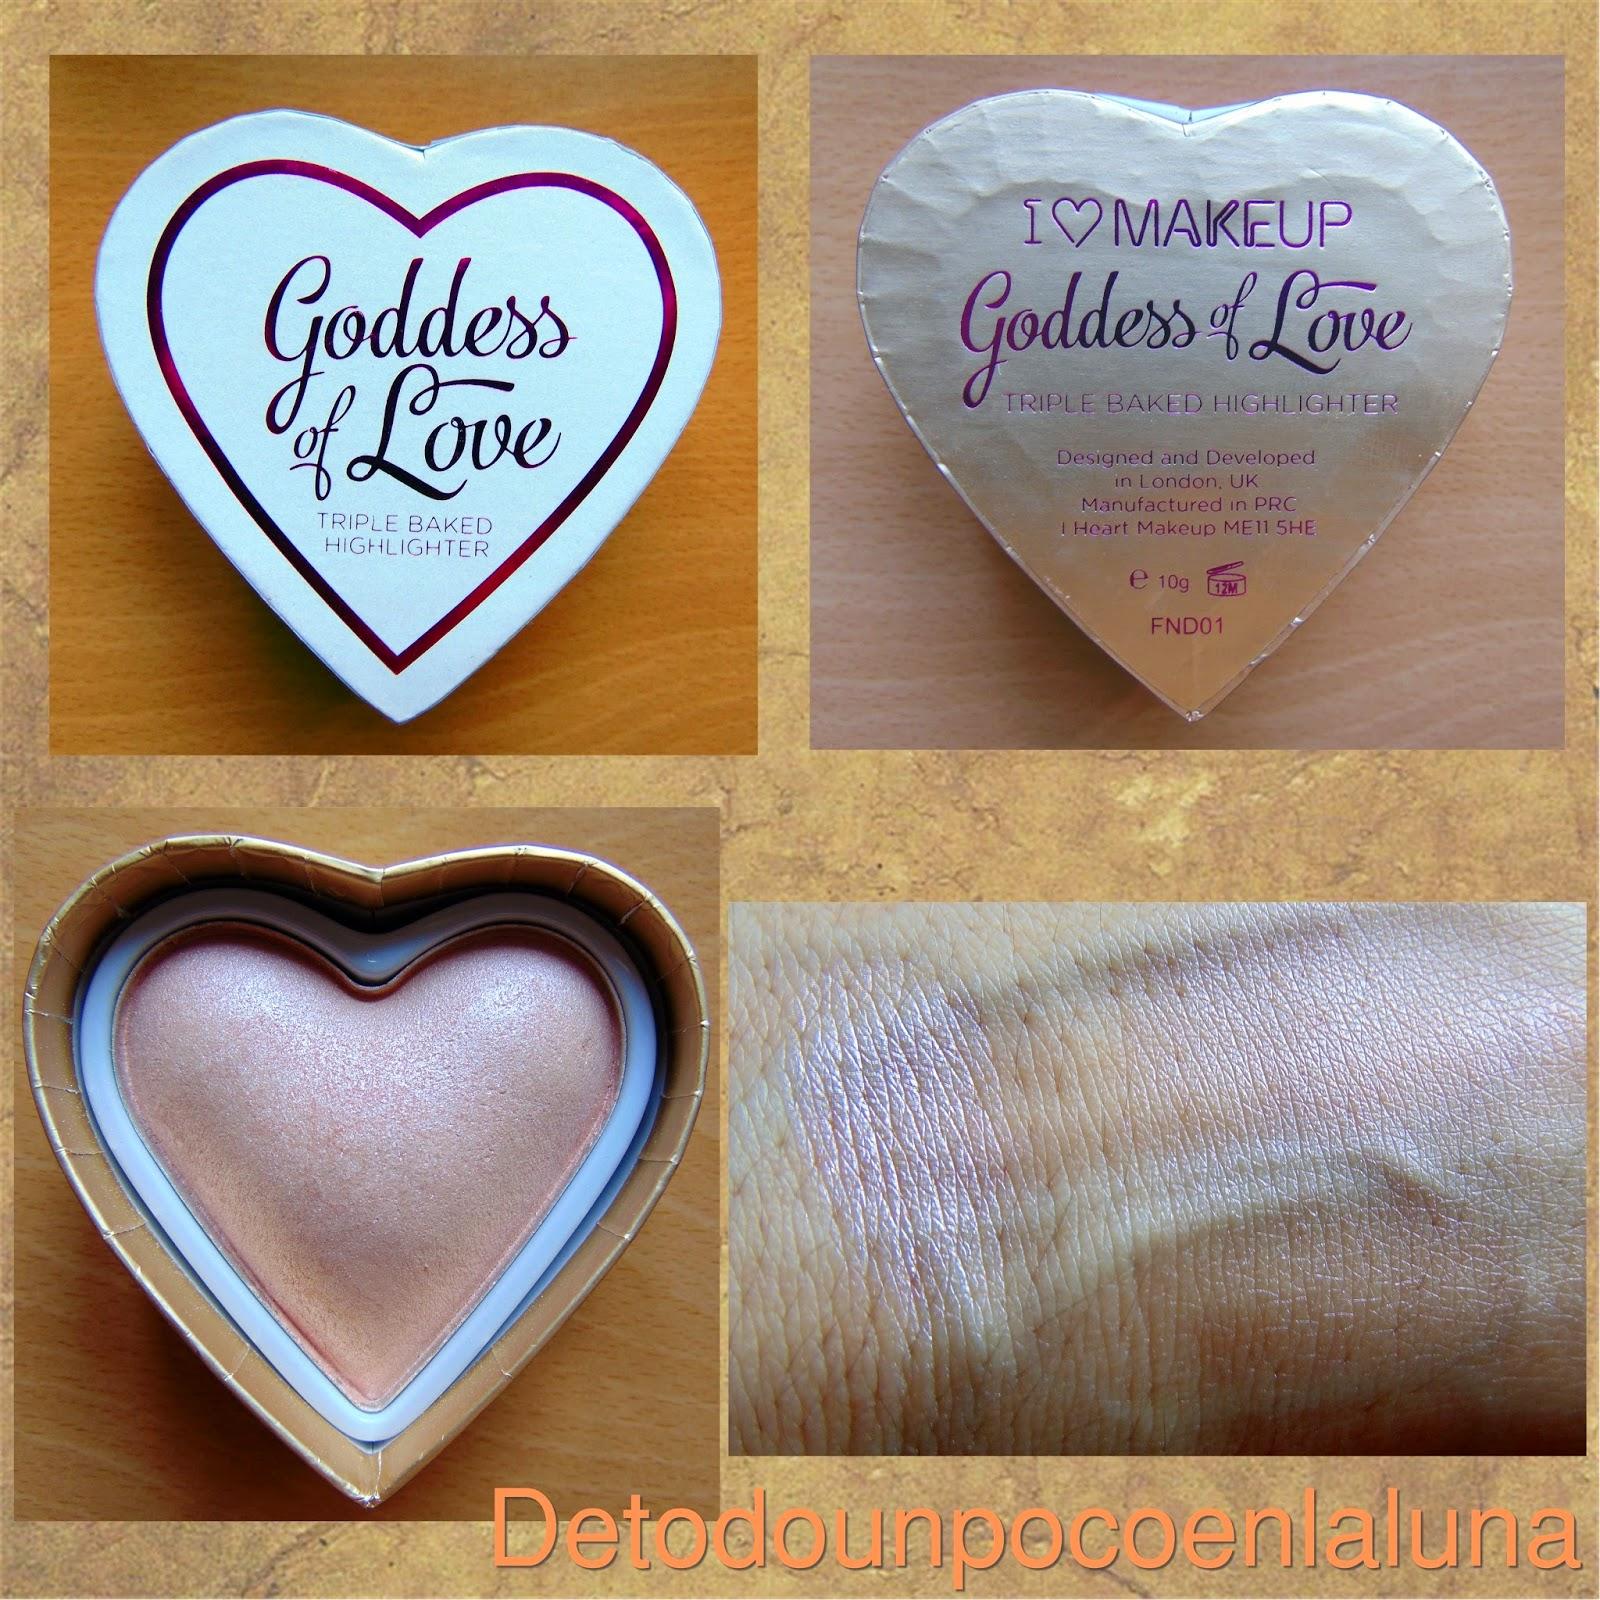 iluminador goddess of love i heart makeup